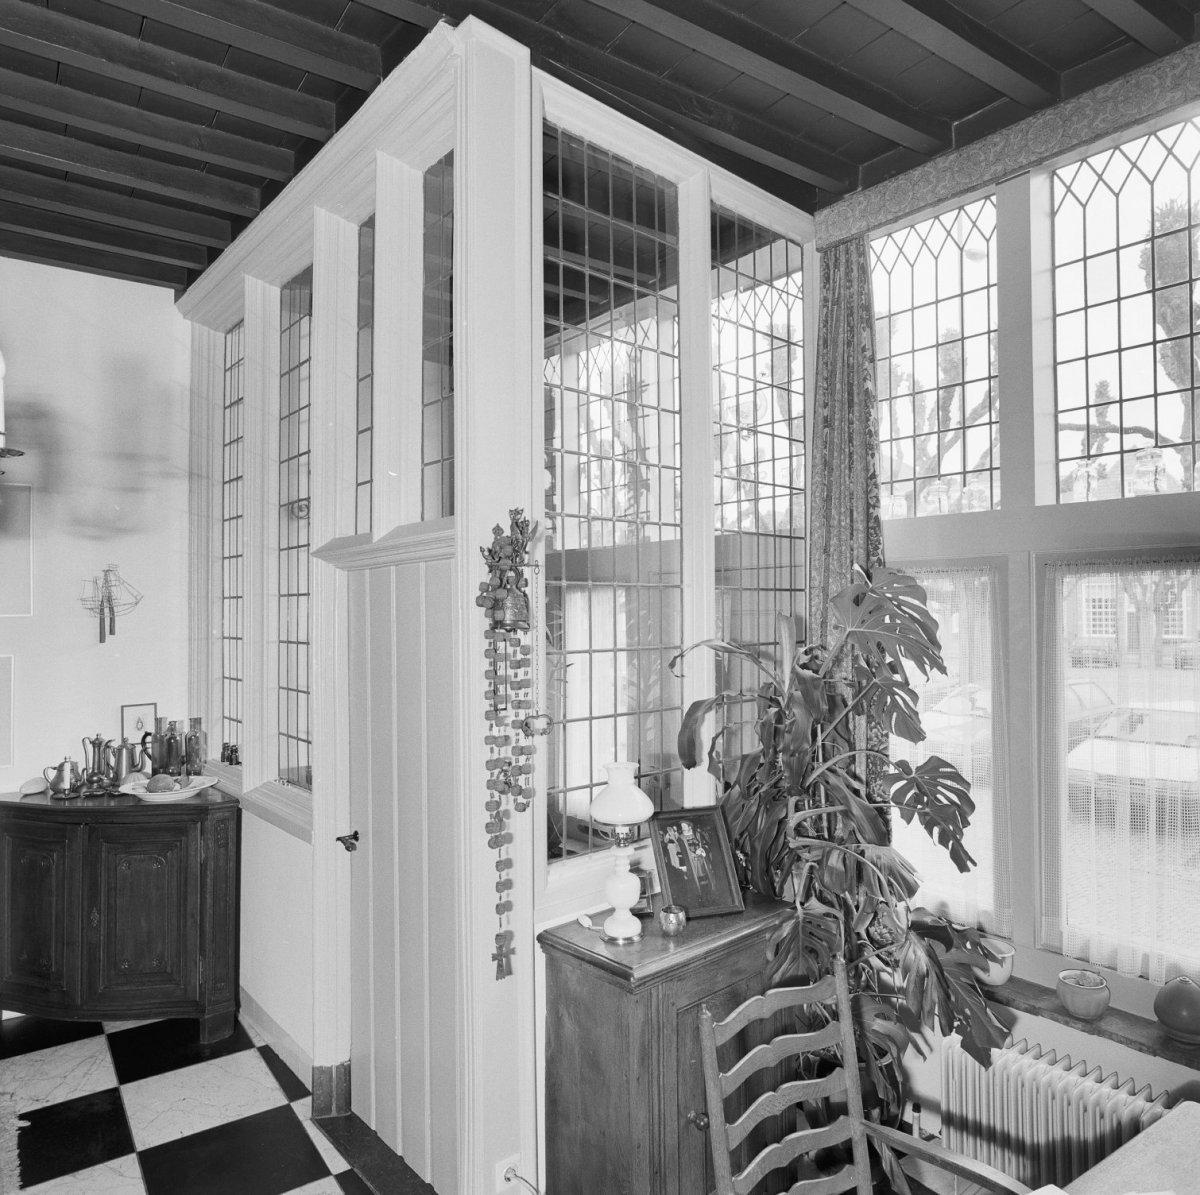 File interieur glazen hal in woonkamer zijaanzicht geertruidenberg 20321475 - Interieur woonkamer ...